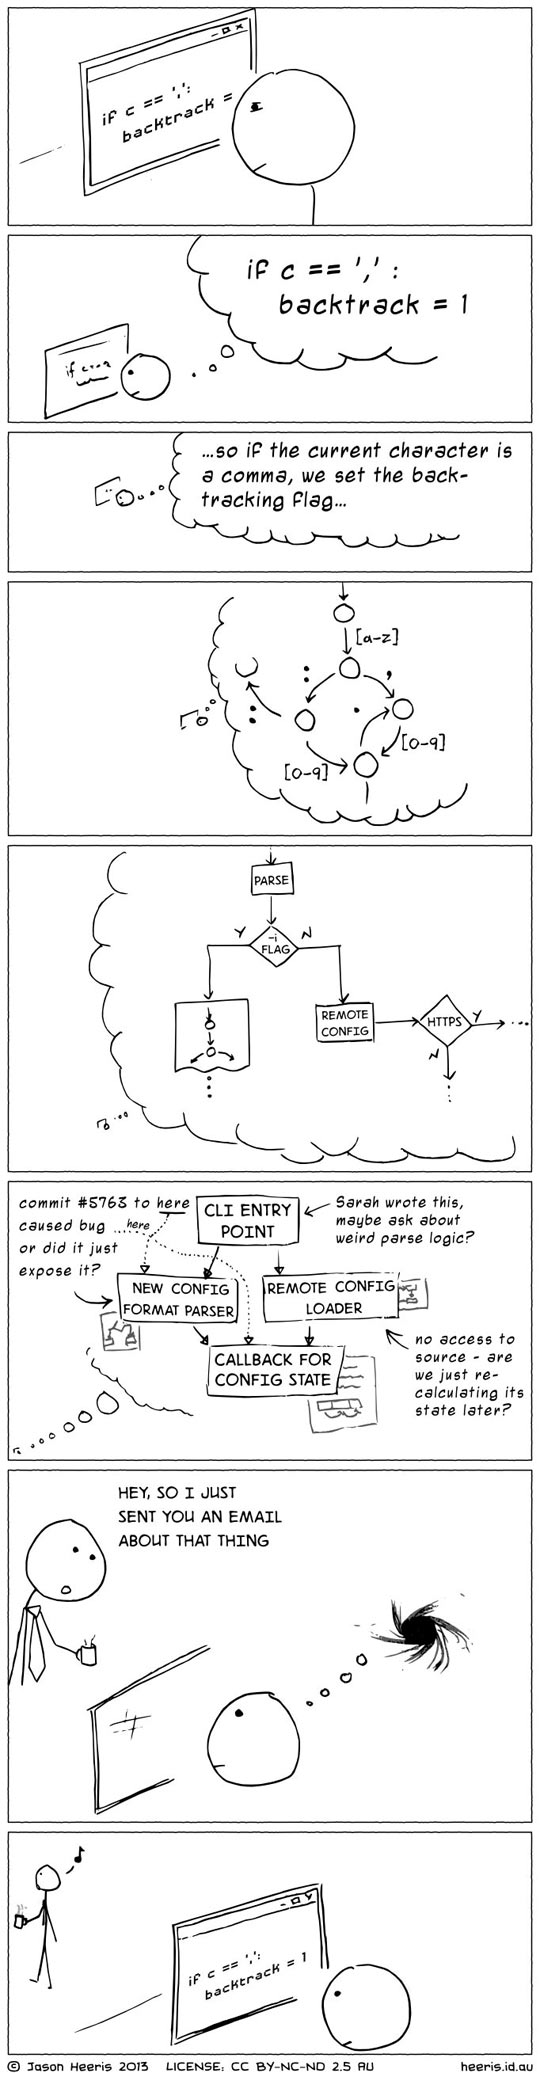 Never interrupt a programmer